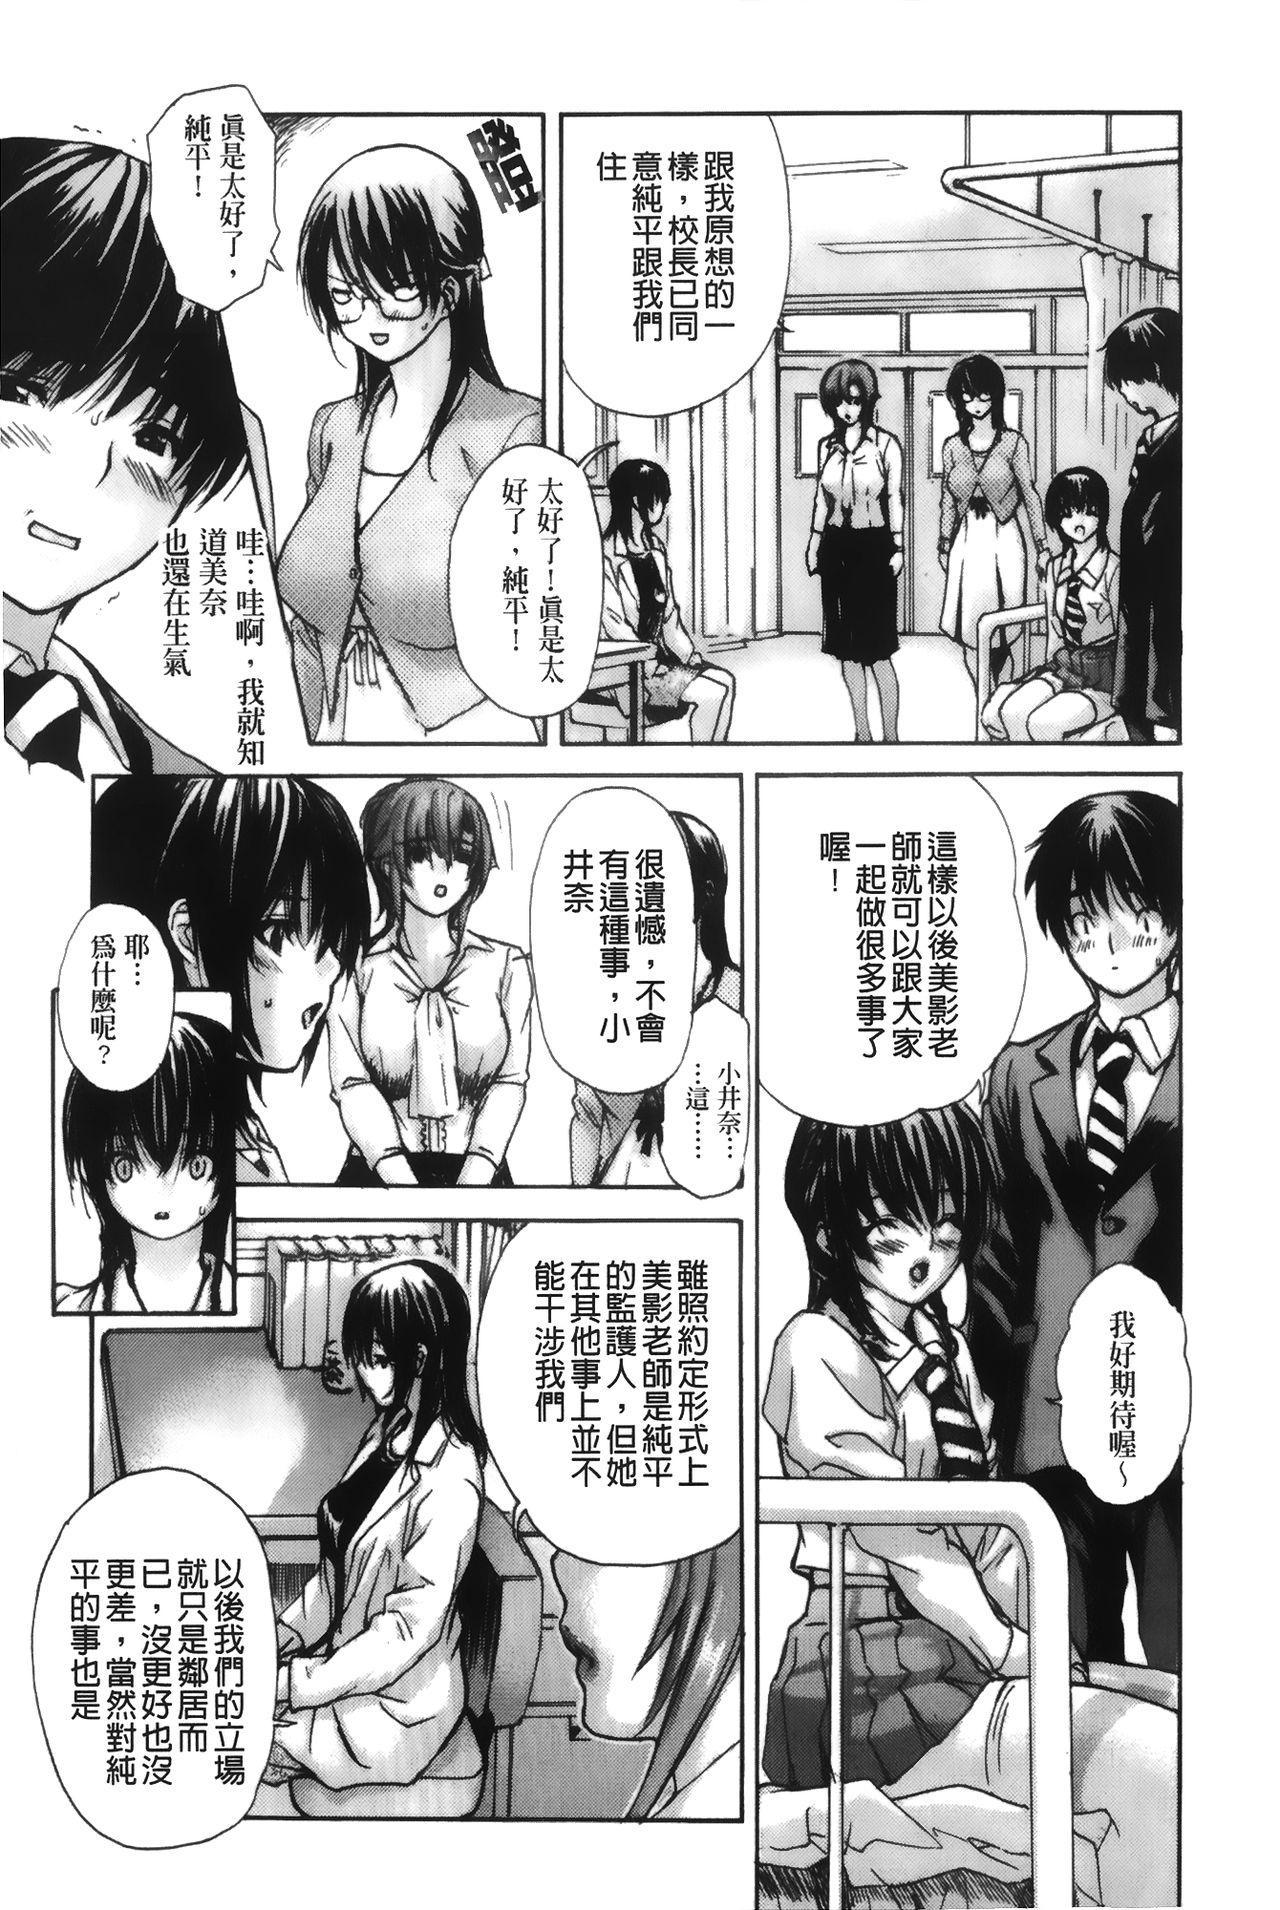 Tonari no Minano Sensei 4 | 隔壁的美奈乃老師 4 172